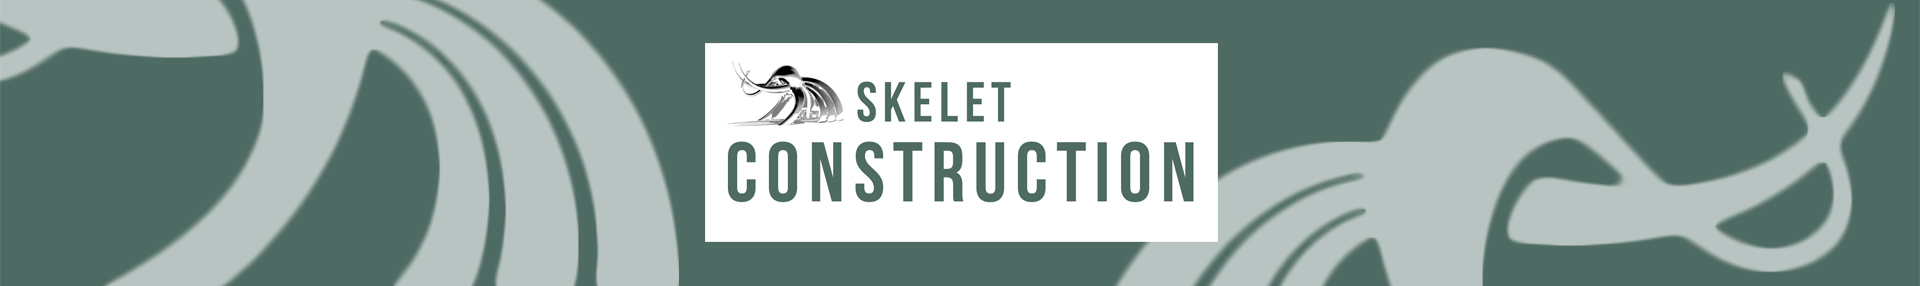 Skelet Construction